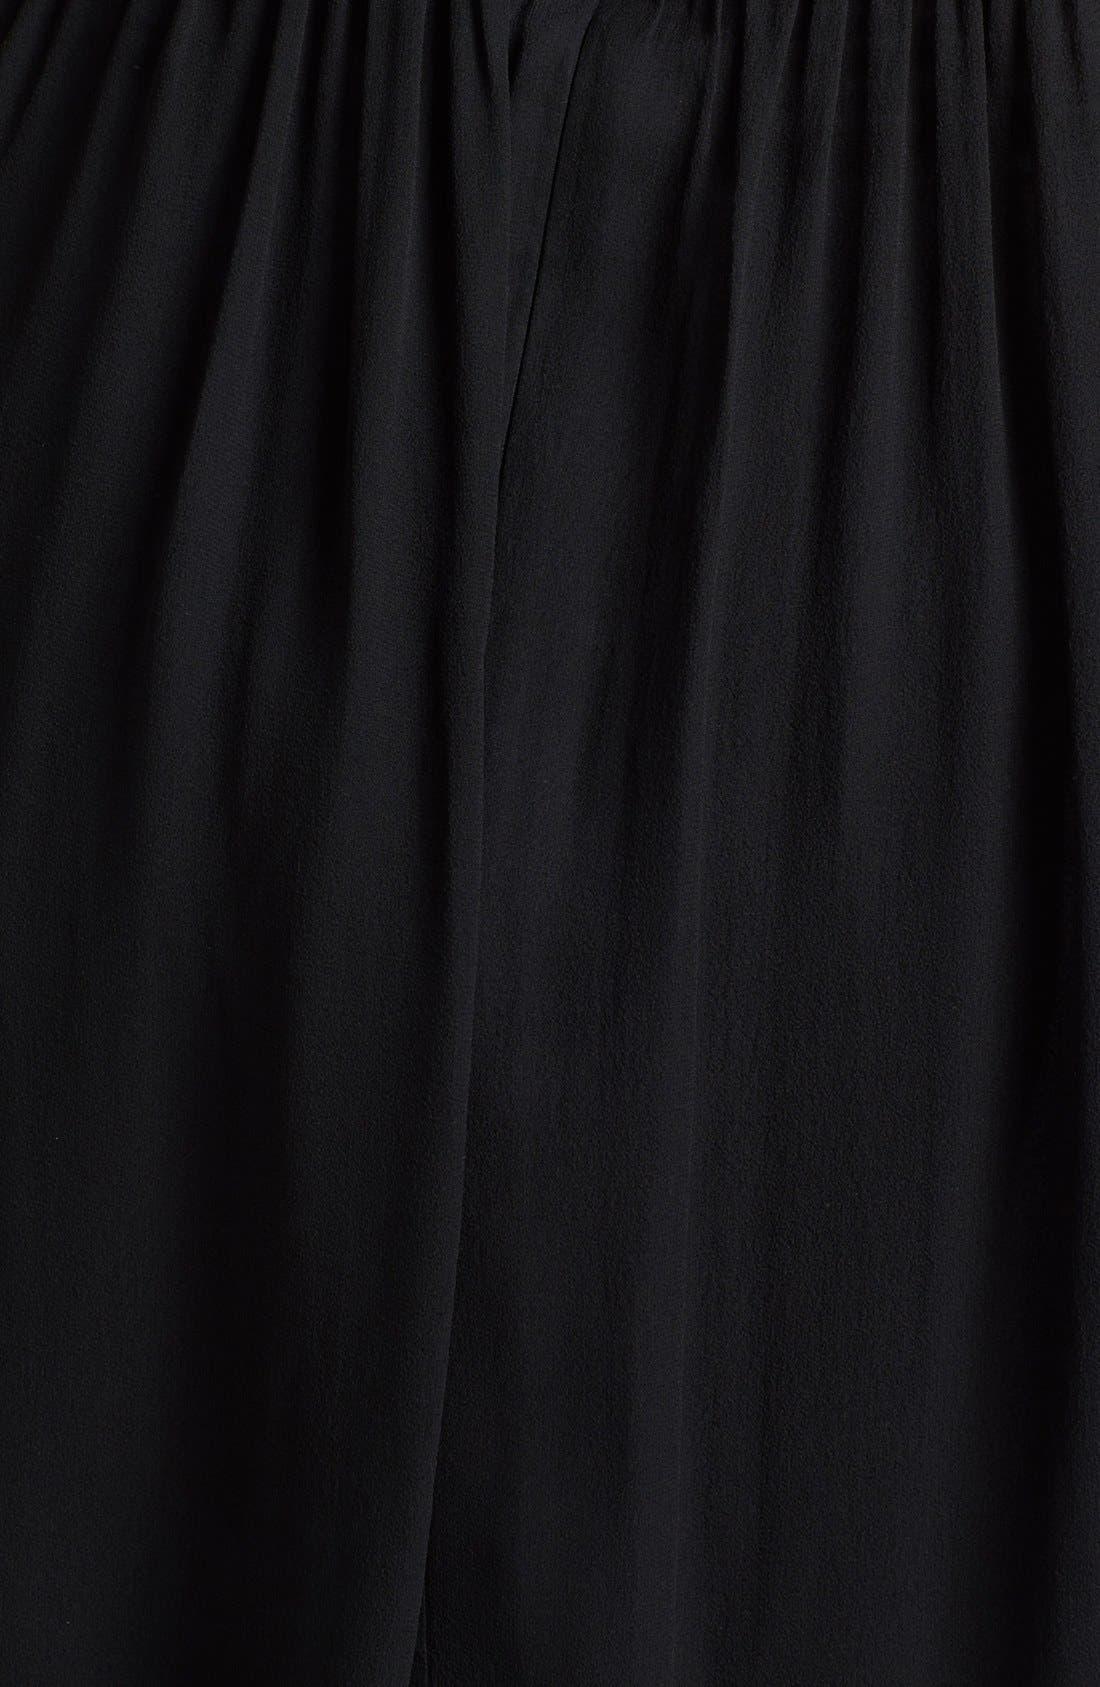 'Morgan' Strapless Silk Chiffon Dress,                             Alternate thumbnail 41, color,